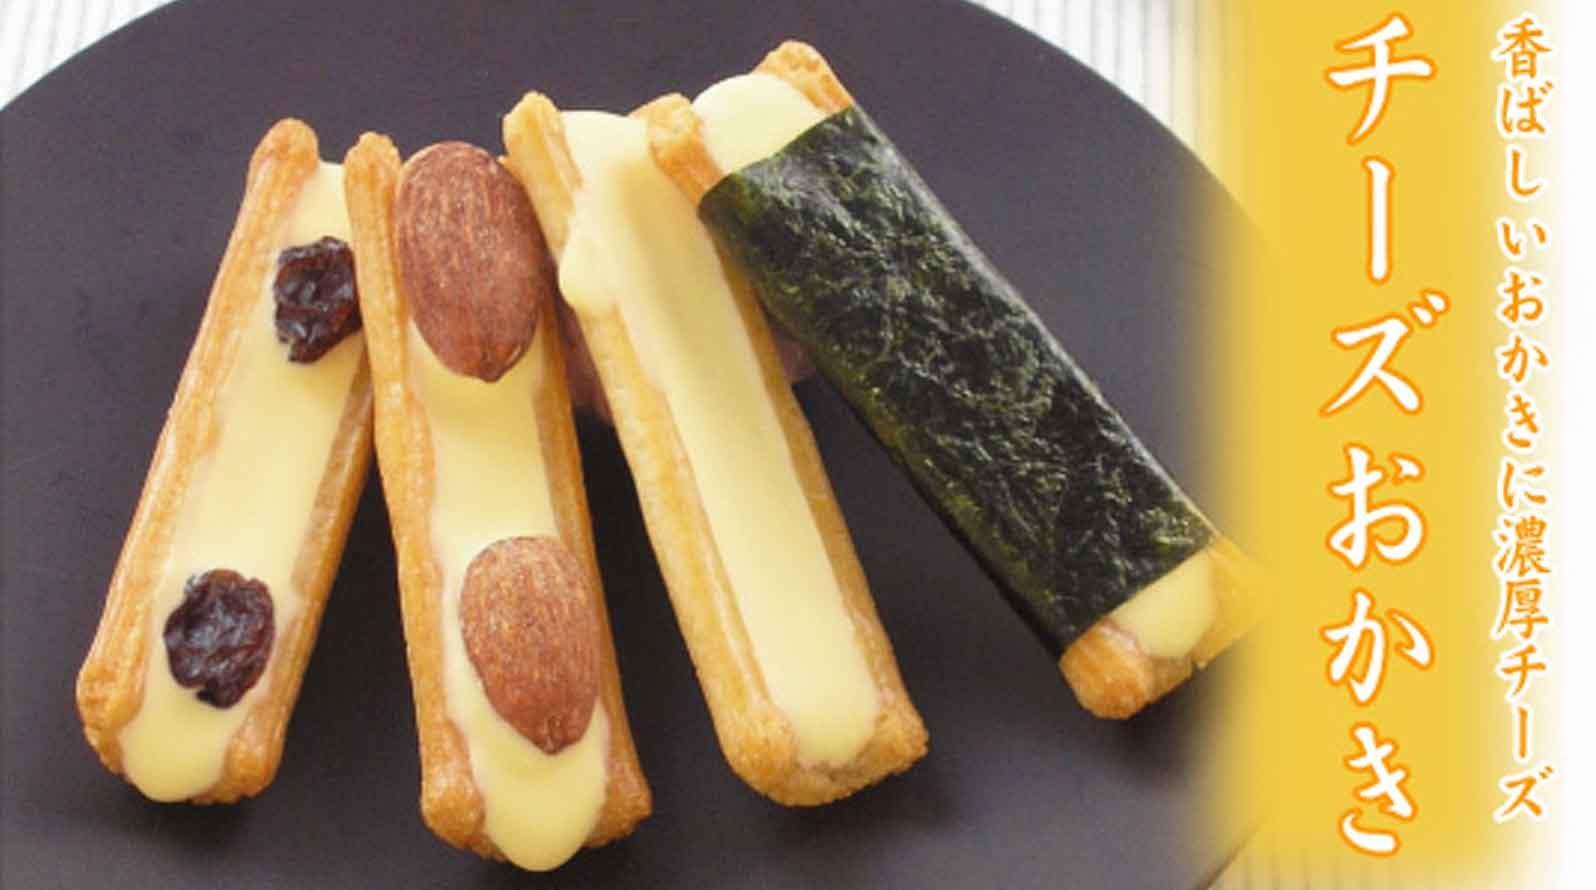 YOSHIKI 不停口的銀座餅乾引發搶購熱潮 價格一連翻漲四倍